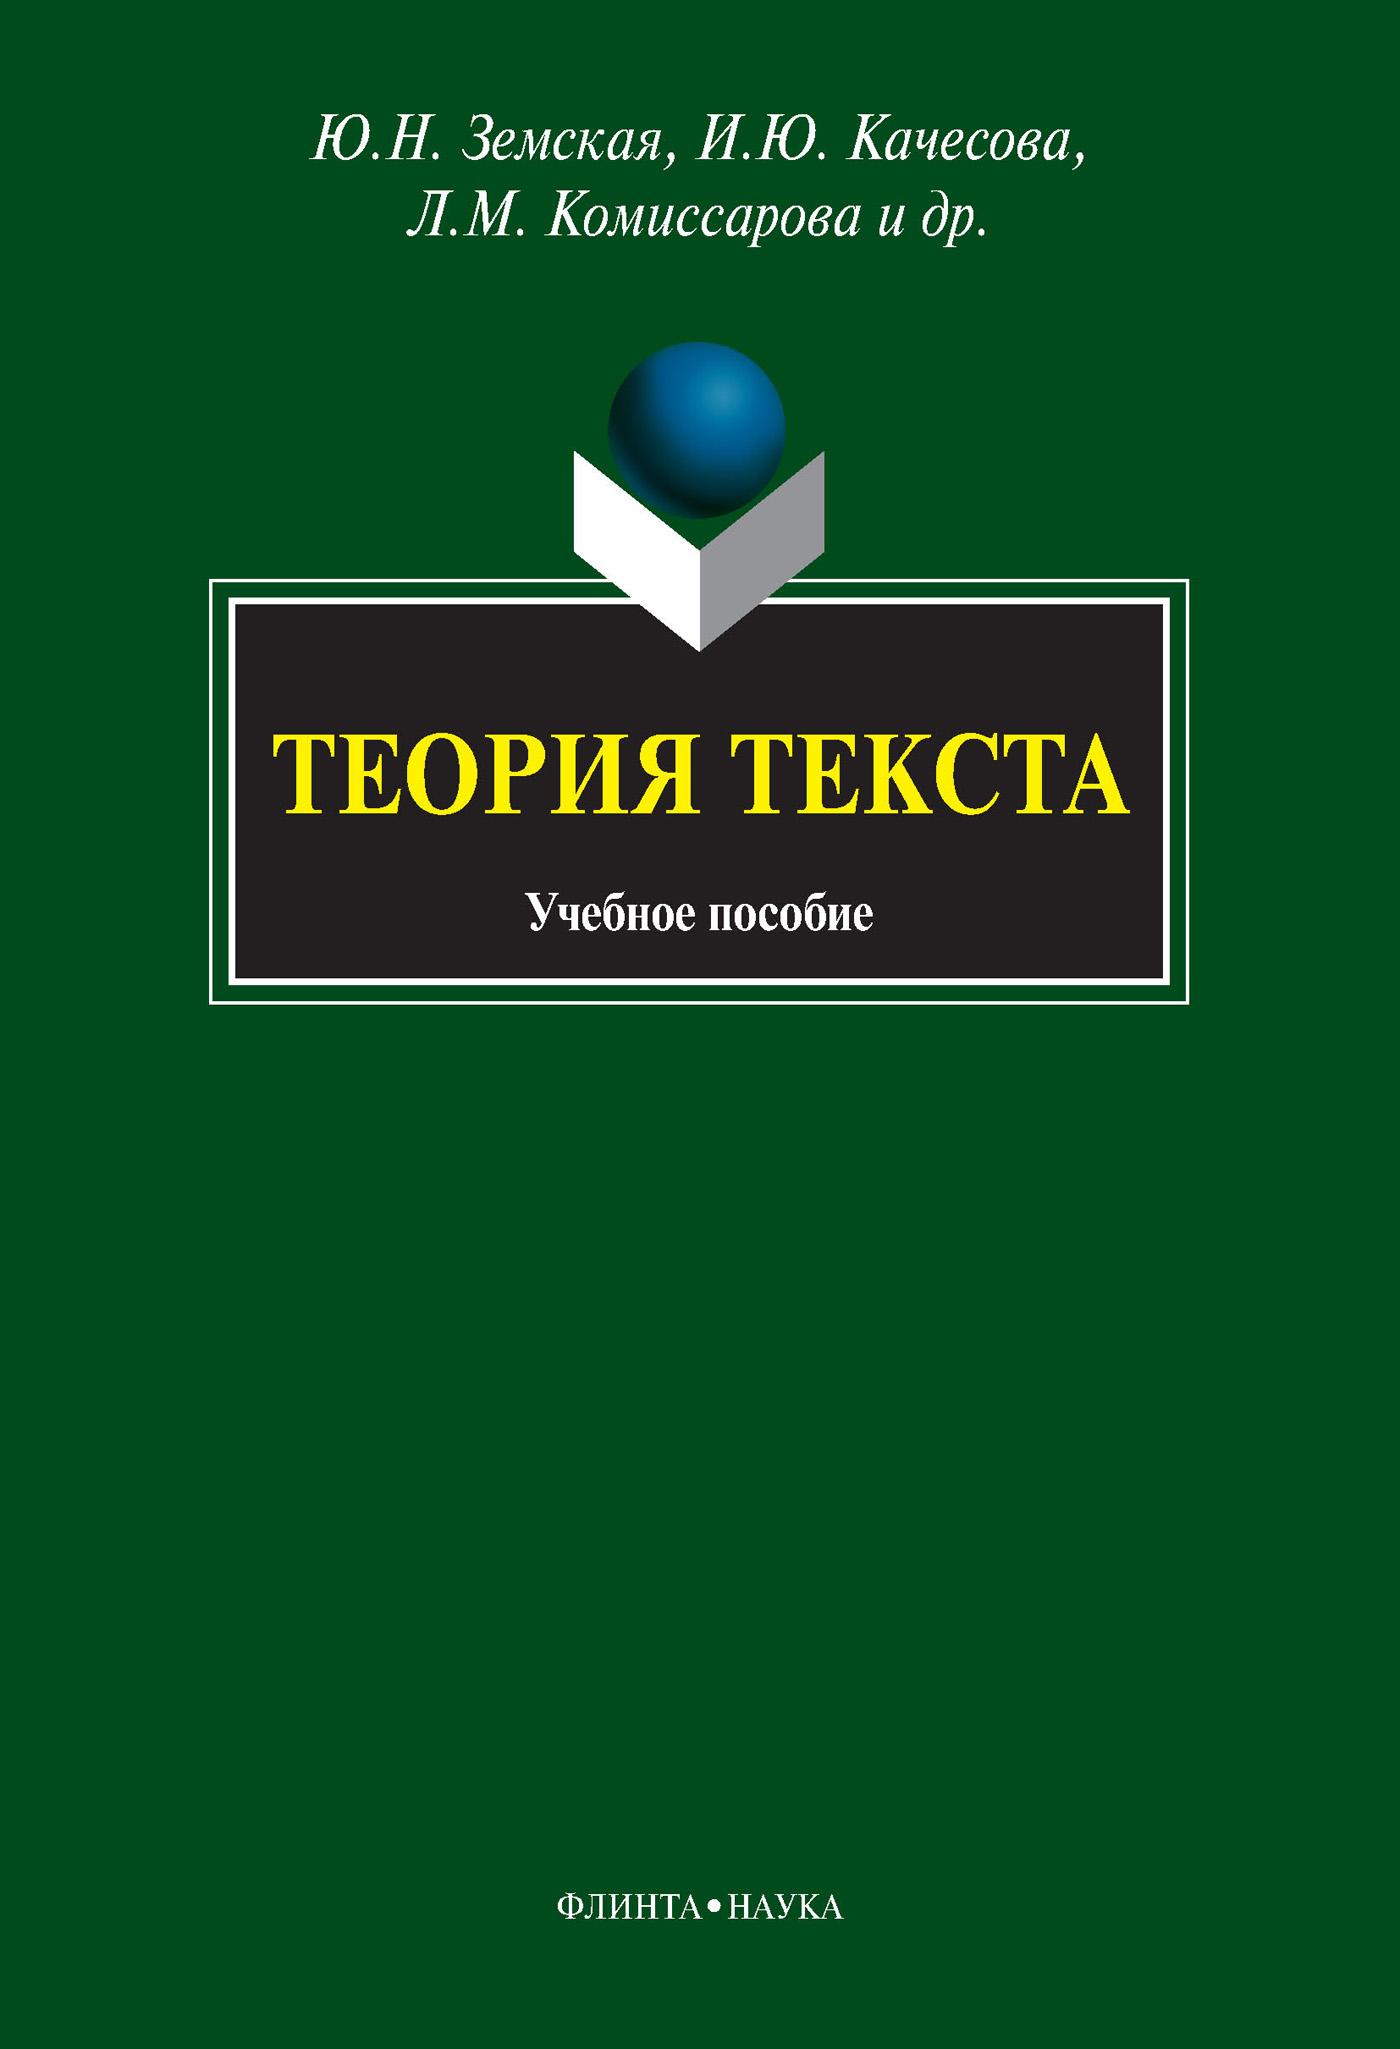 Ю. Н. Земская Теория текста. Учебное пособие цена